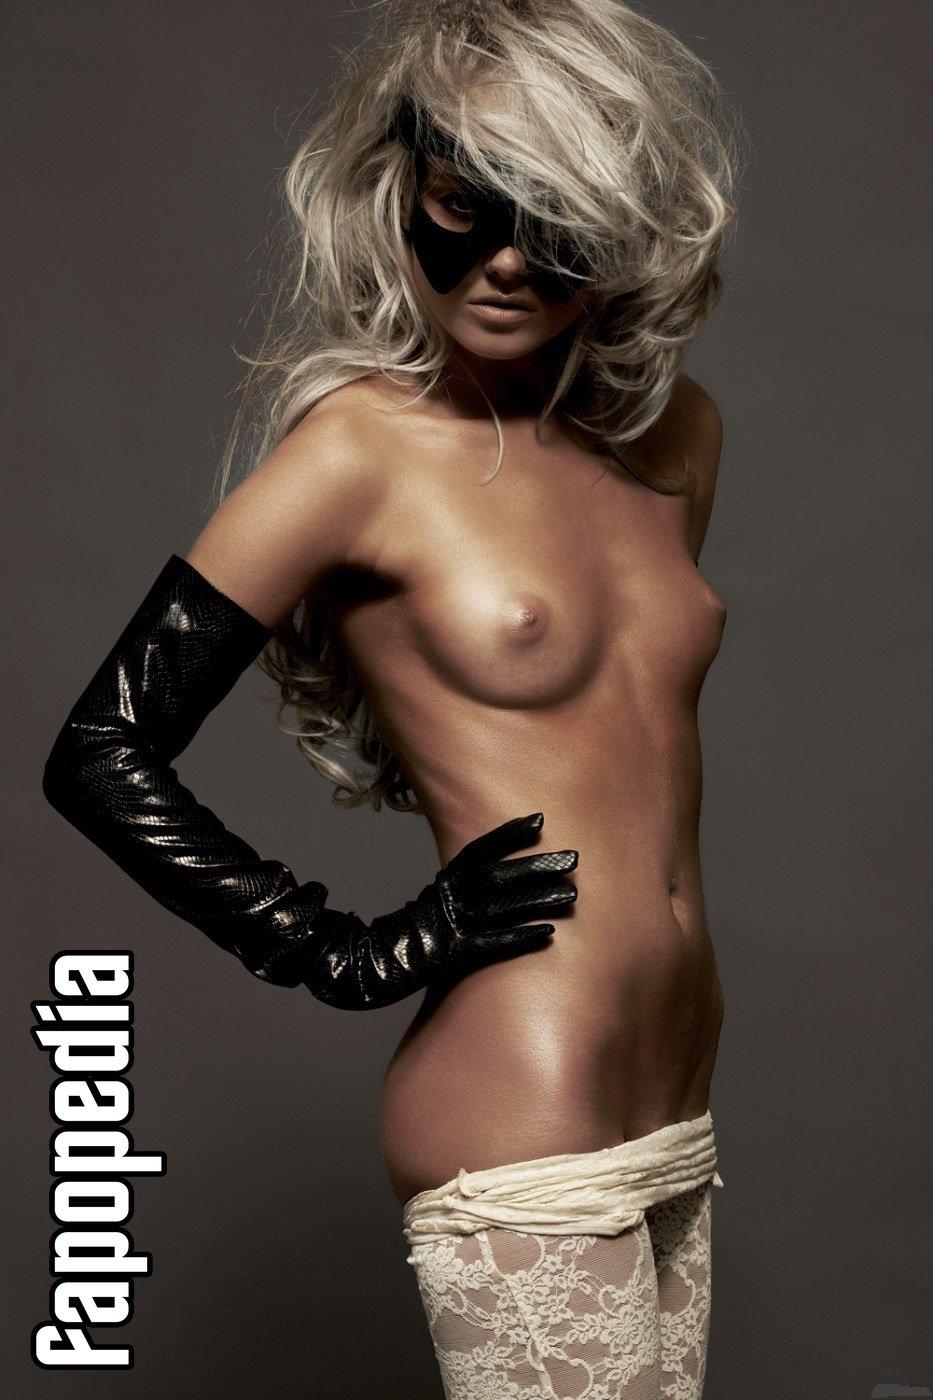 Gabriella toth nude